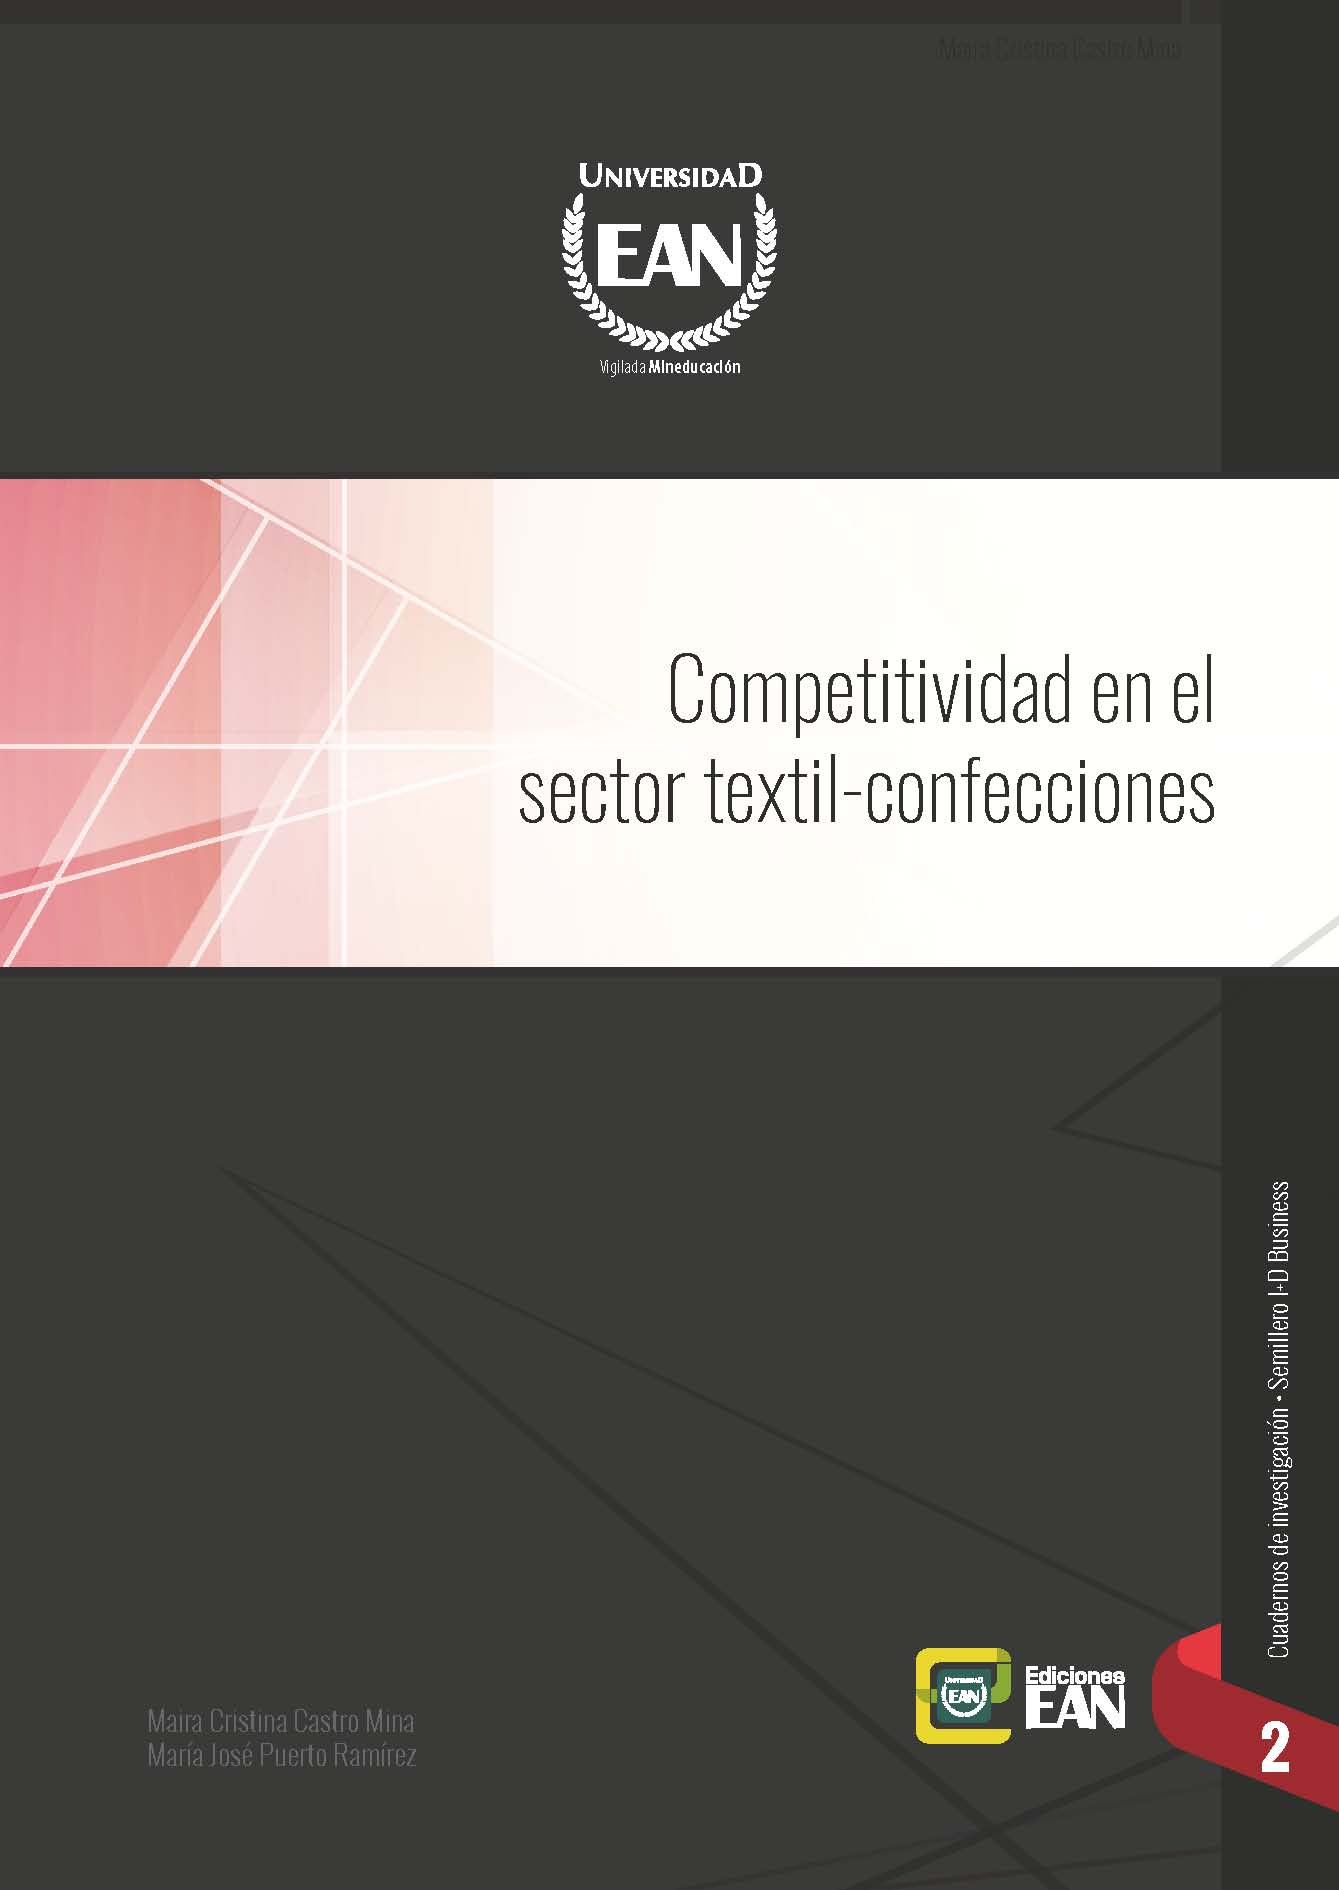 Competitividad en el sector textil-confecciones